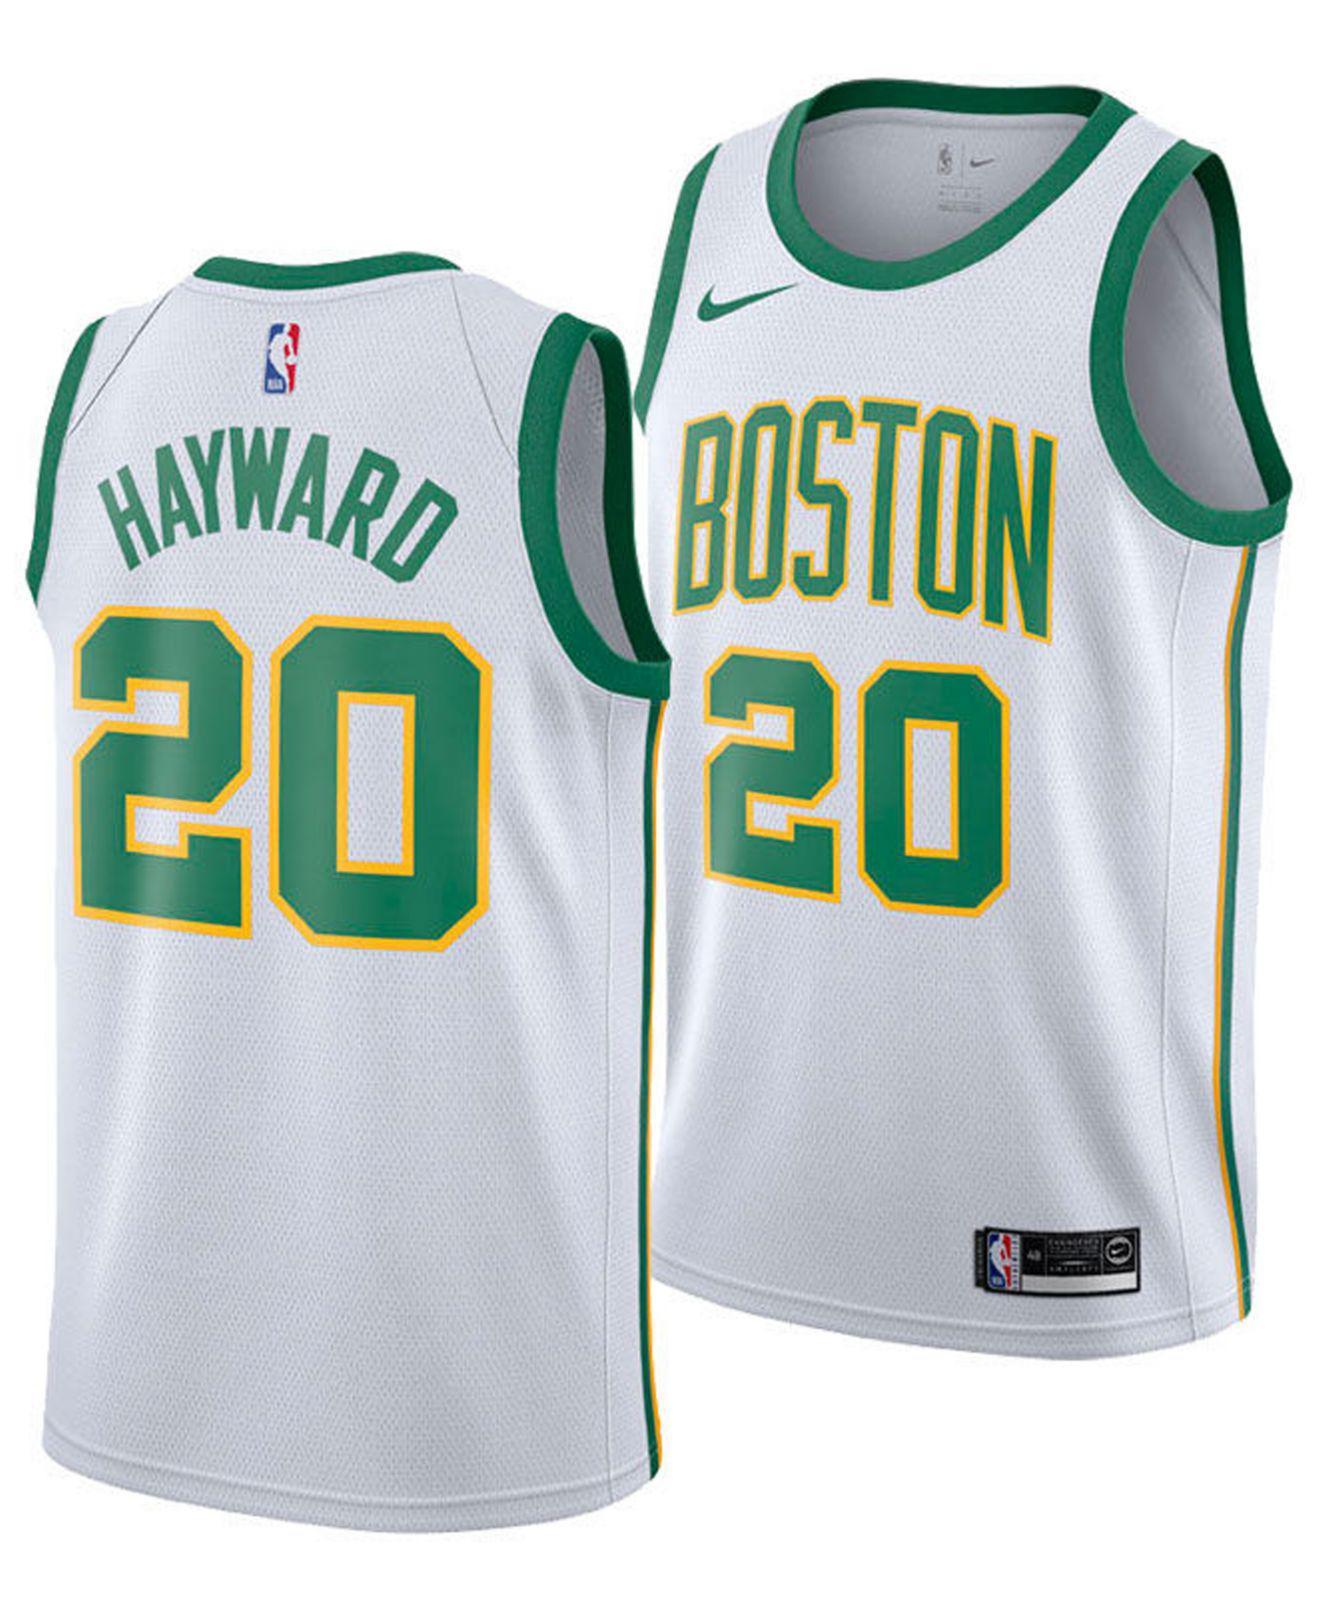 99ab622ff Nike. Men s White Gordon Hayward Boston Celtics City Swingman Jersey 2018